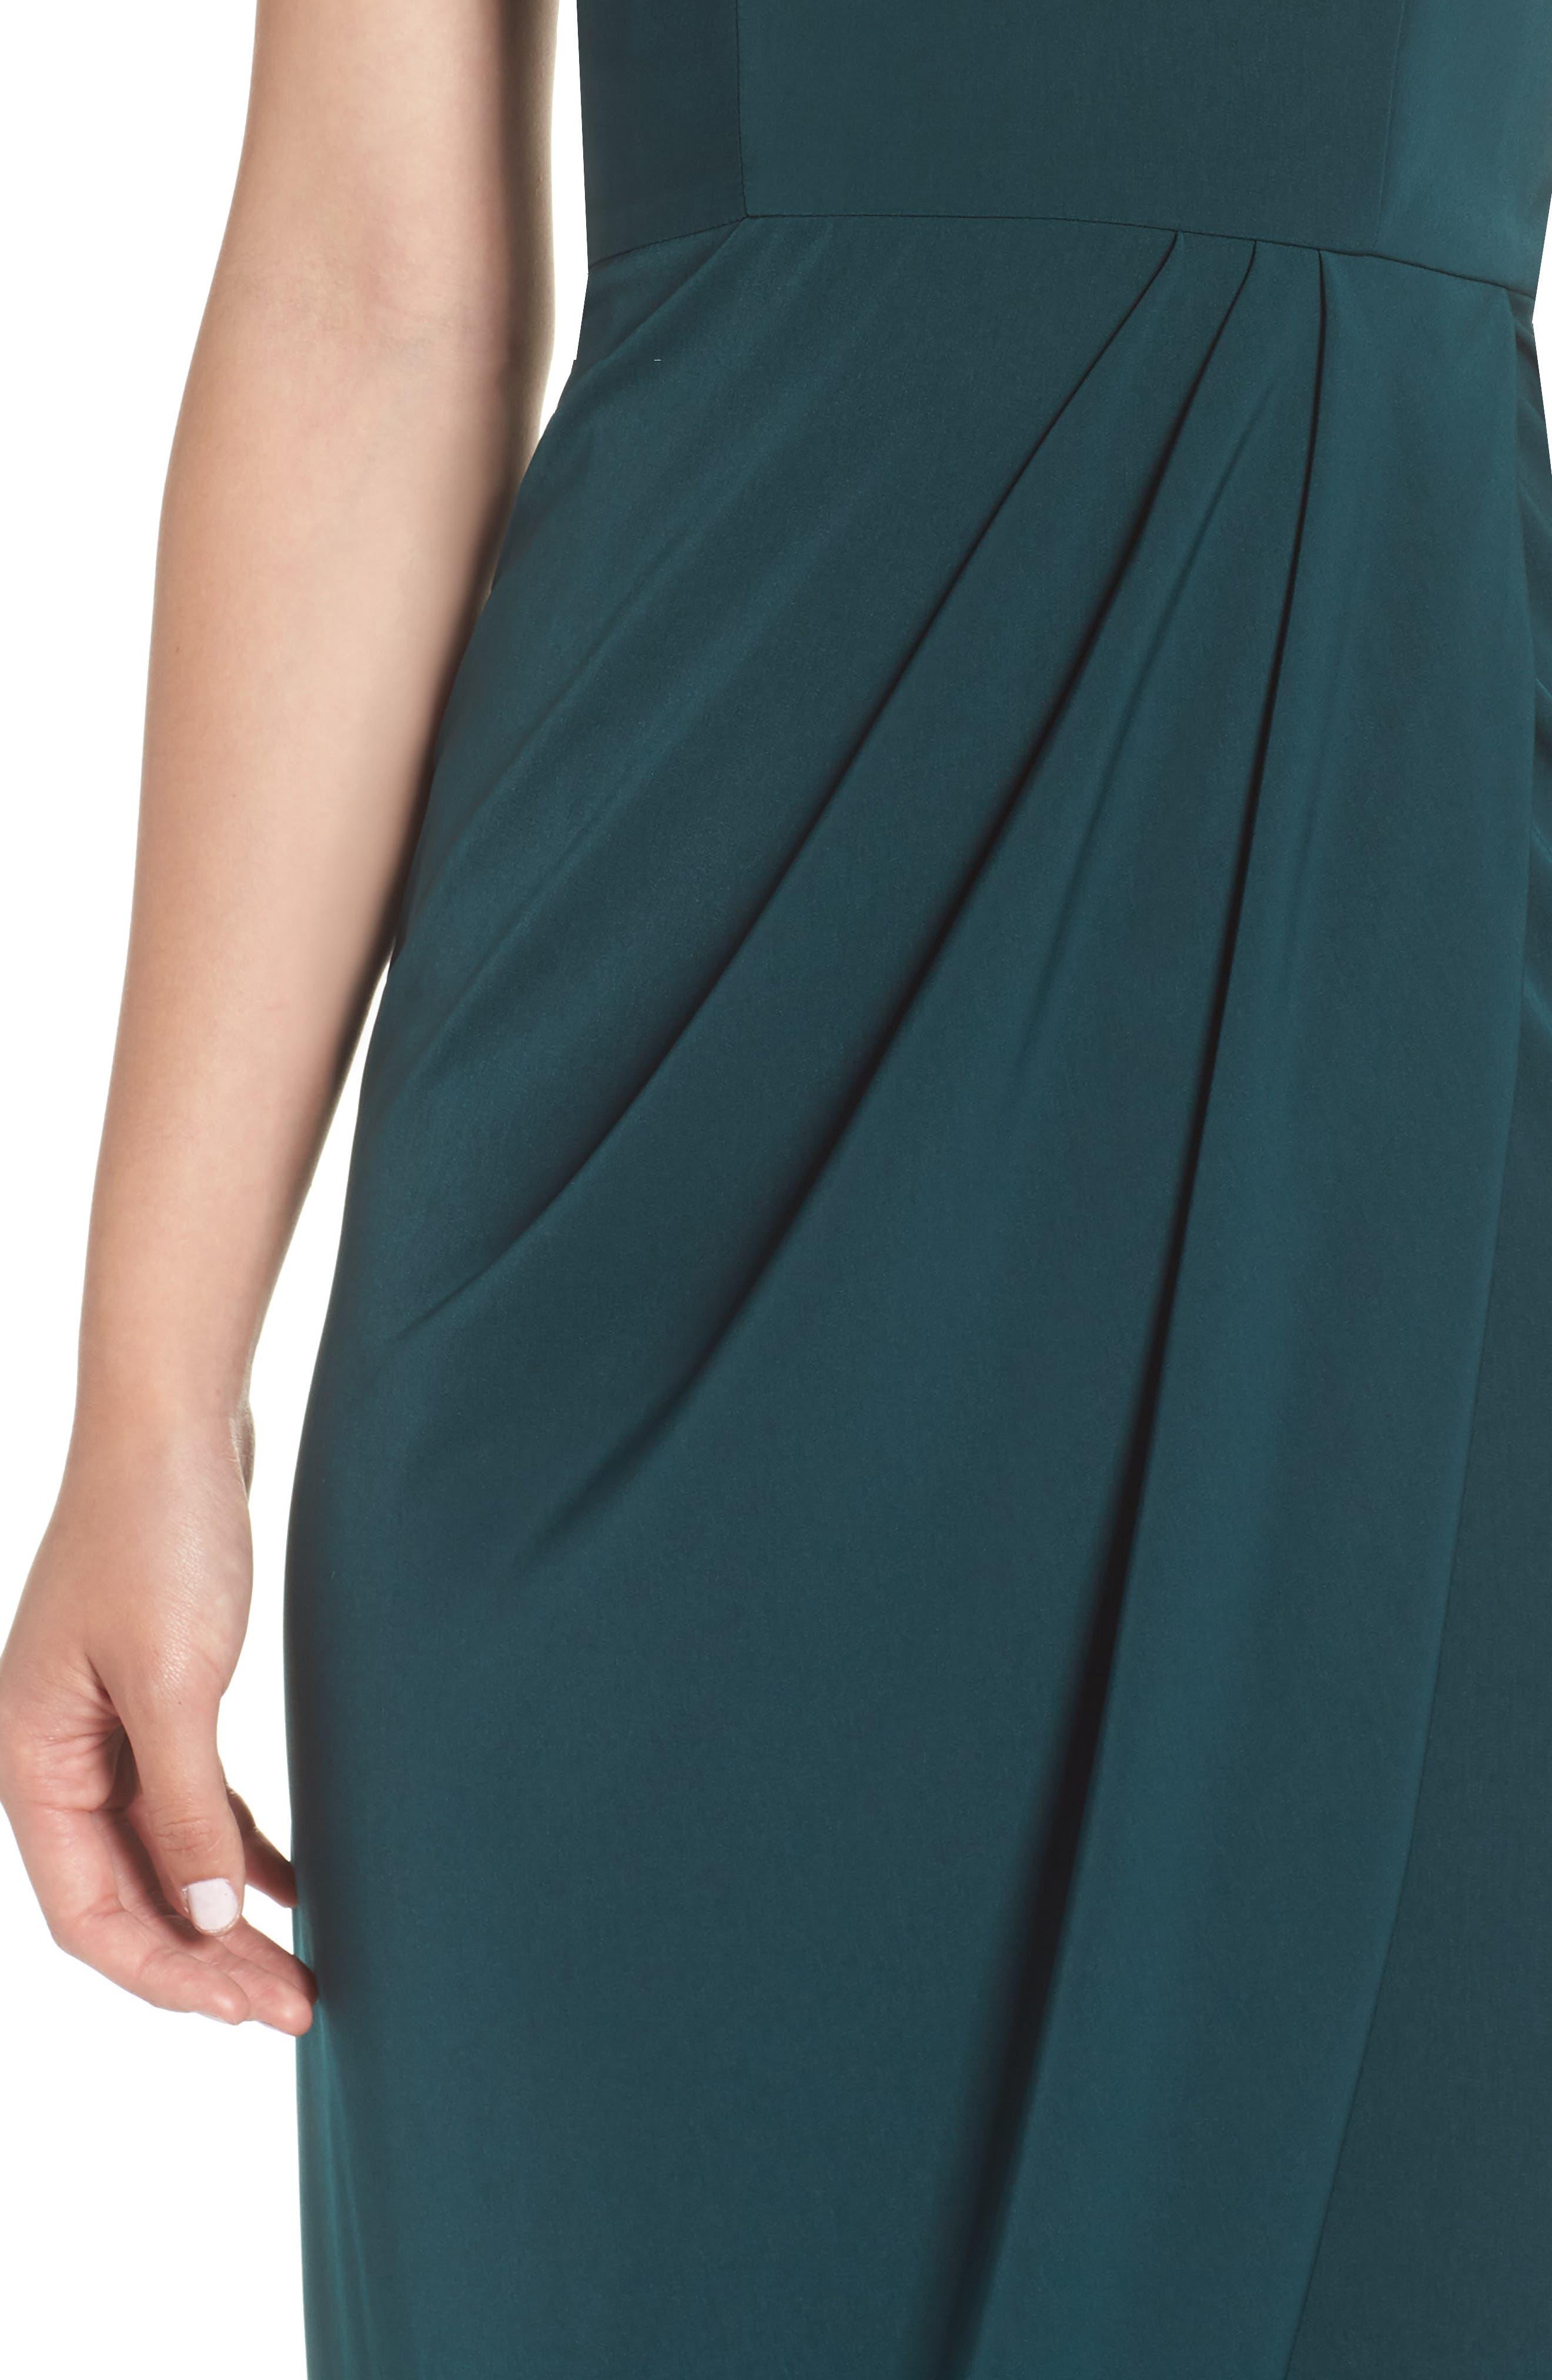 SHONA JOY, Tulip Hem Maxi Dress, Alternate thumbnail 5, color, SEAWEED